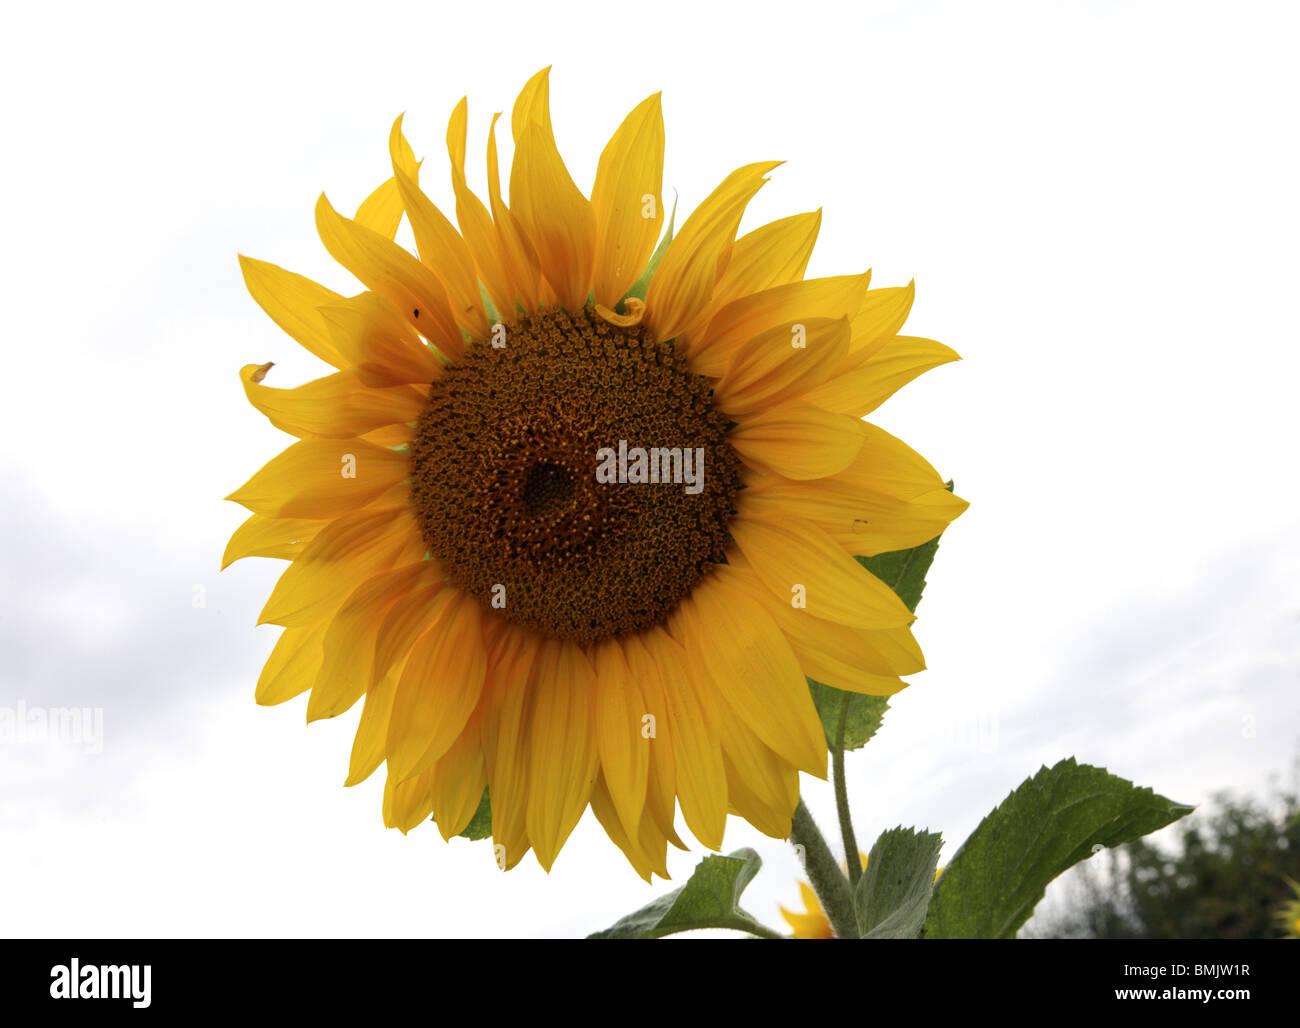 Sunflower. - Stock Image